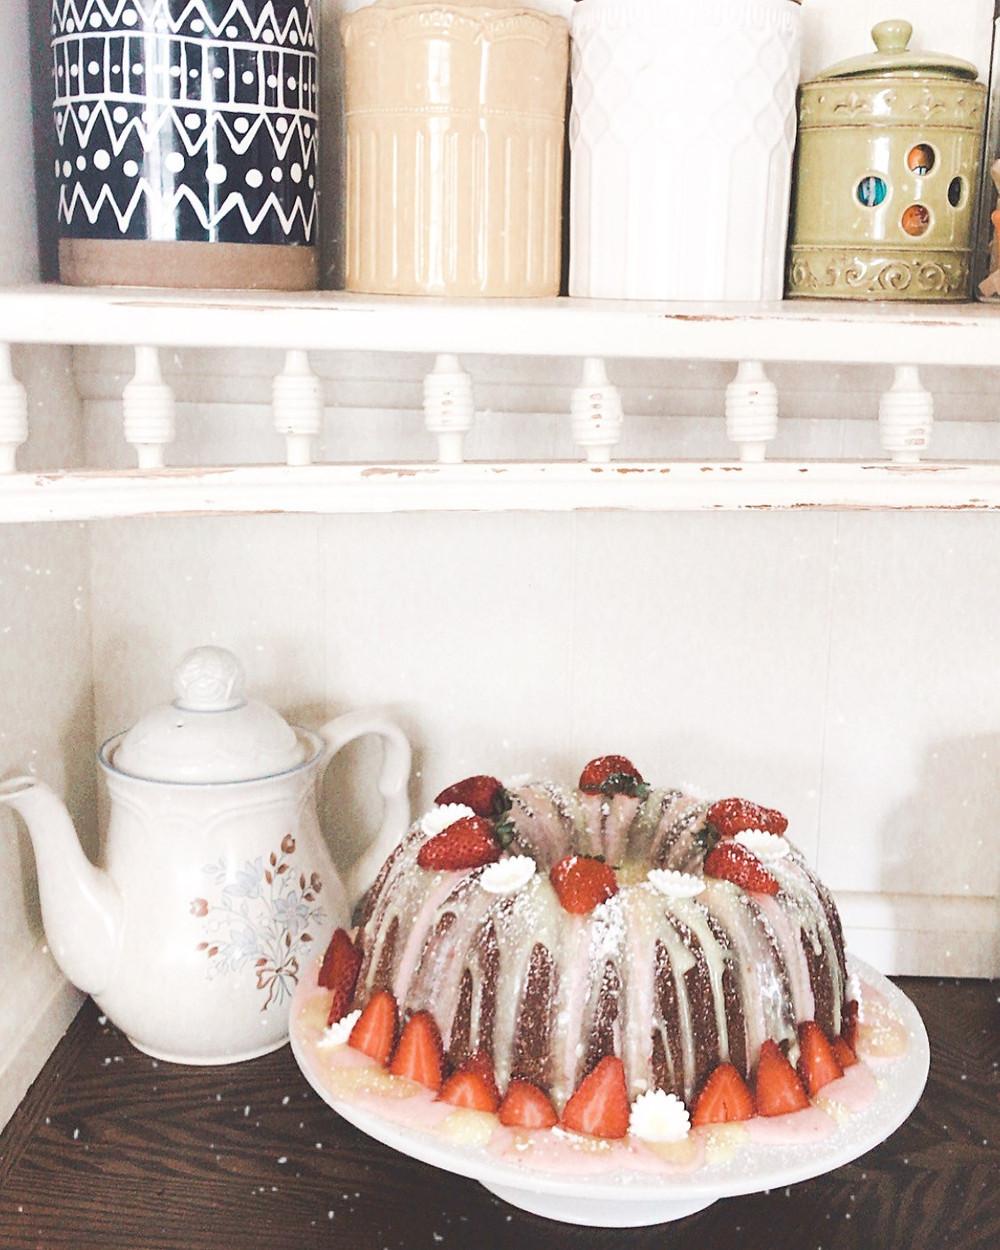 Best White Cake Recipe, White Cake, Vanilla Cake, Birthday Cake, Recipe, Dessert, Cake, Cake stand, lemonade cake, lemon, lemon vitality oil, lemon cake, baking with oils, essential oils